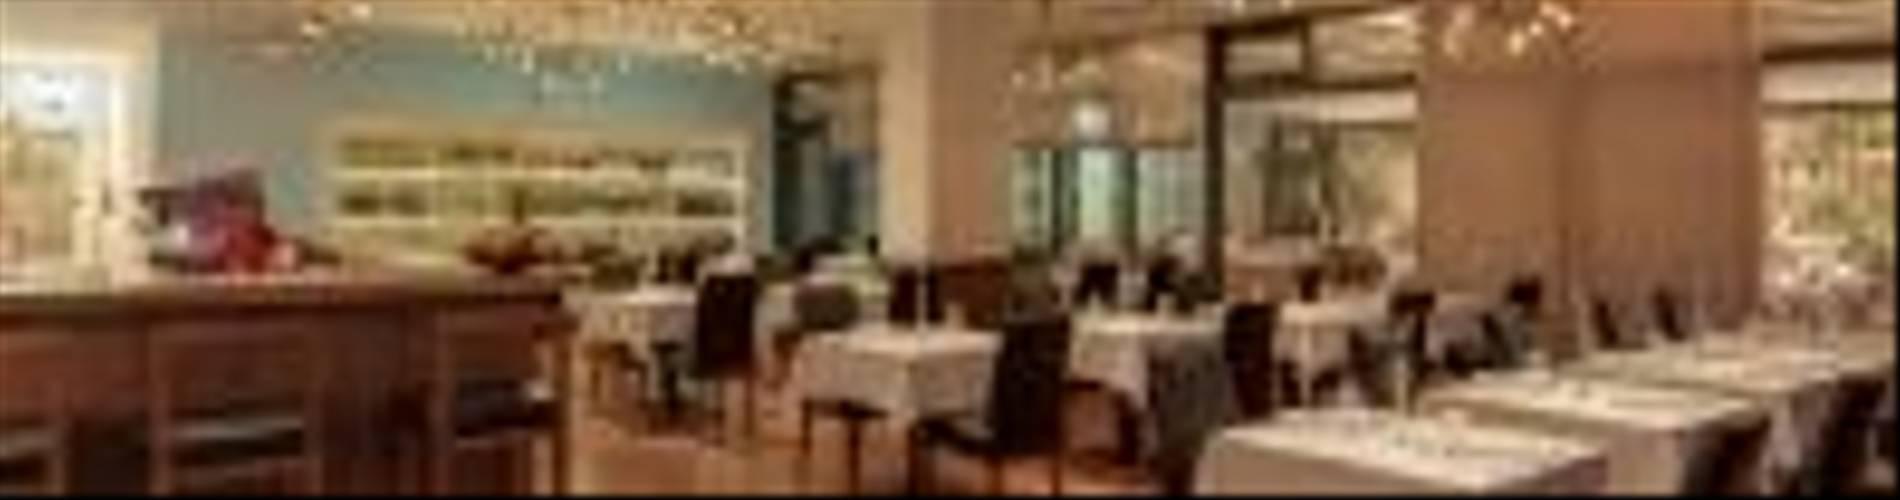 HotelResidence_DIOKLECIJAN_restaurant-dinner-interior-panorama_2048px_DSC04309-198x120.jpg